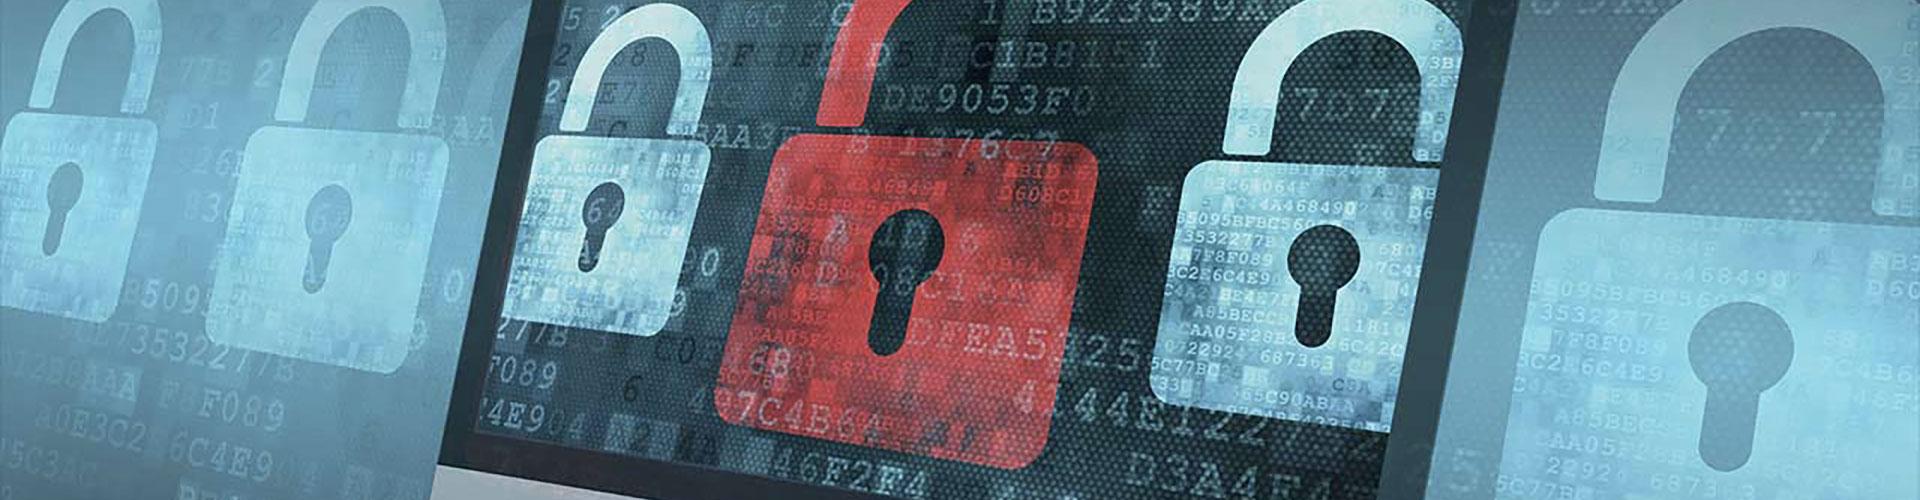 b-one soluzioni per la sicurezza digitale: NethSecurity ed ESTE nod 32